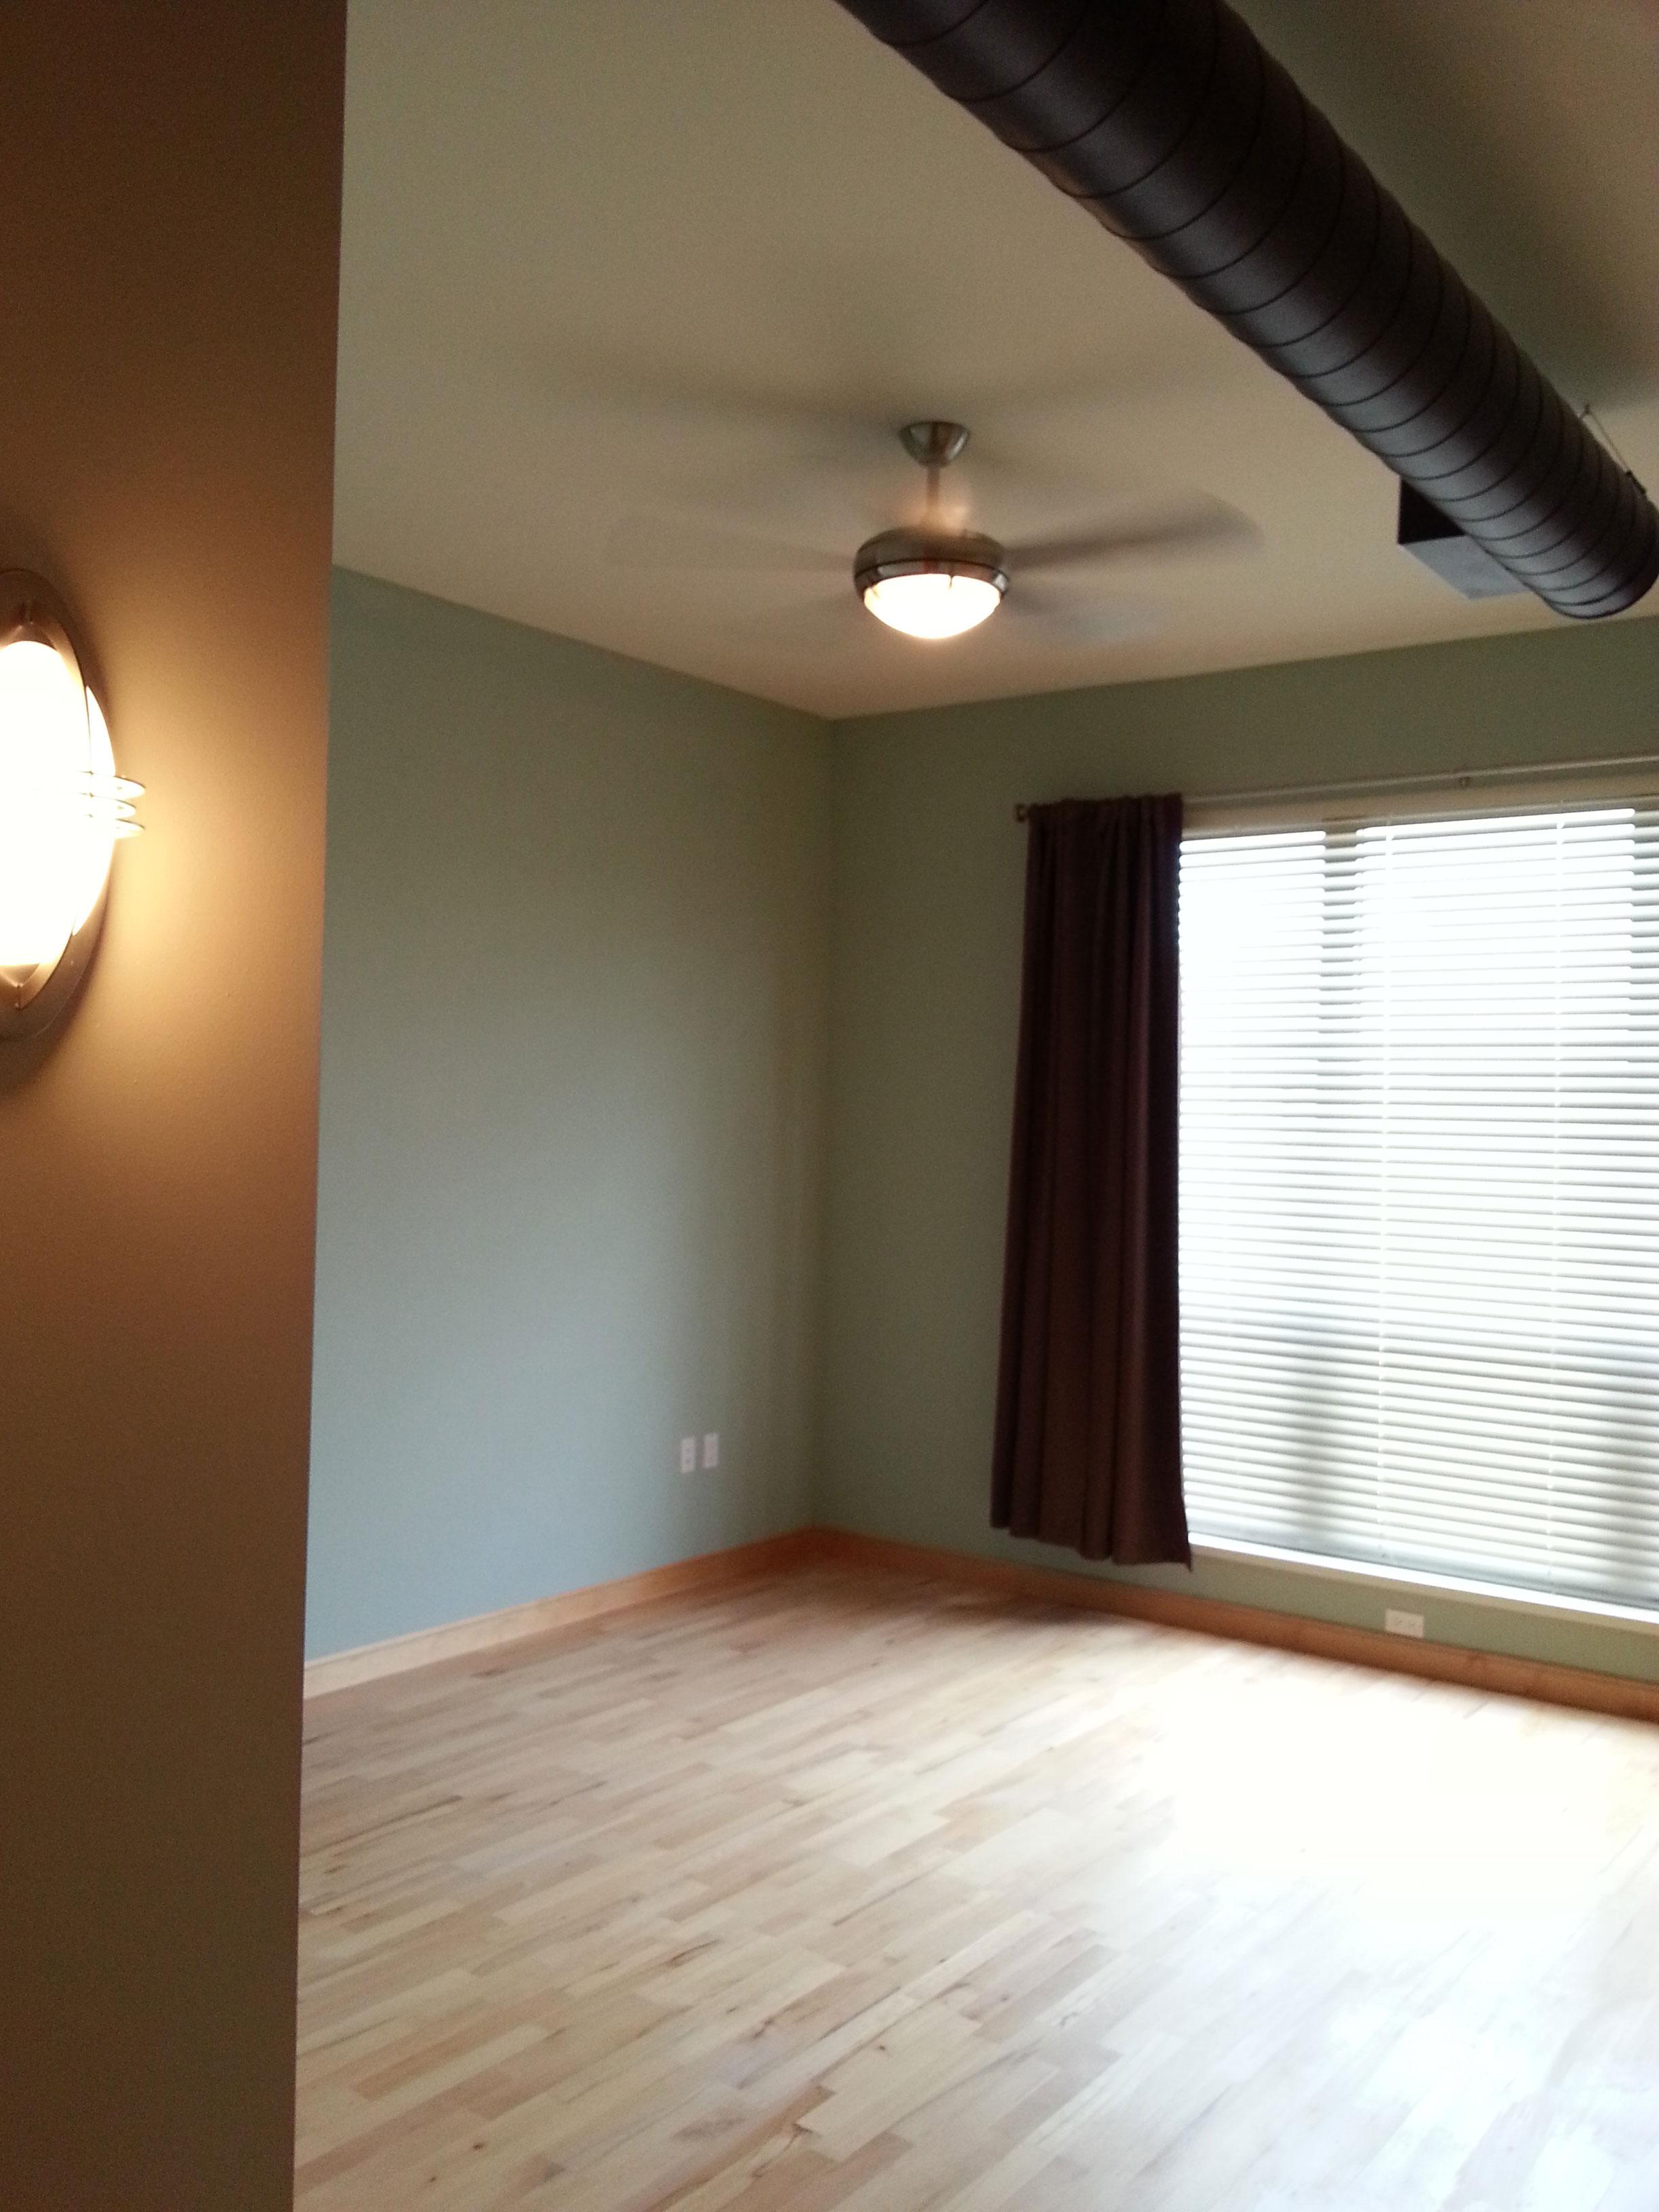 condo-painting-interior-lofts.jpg